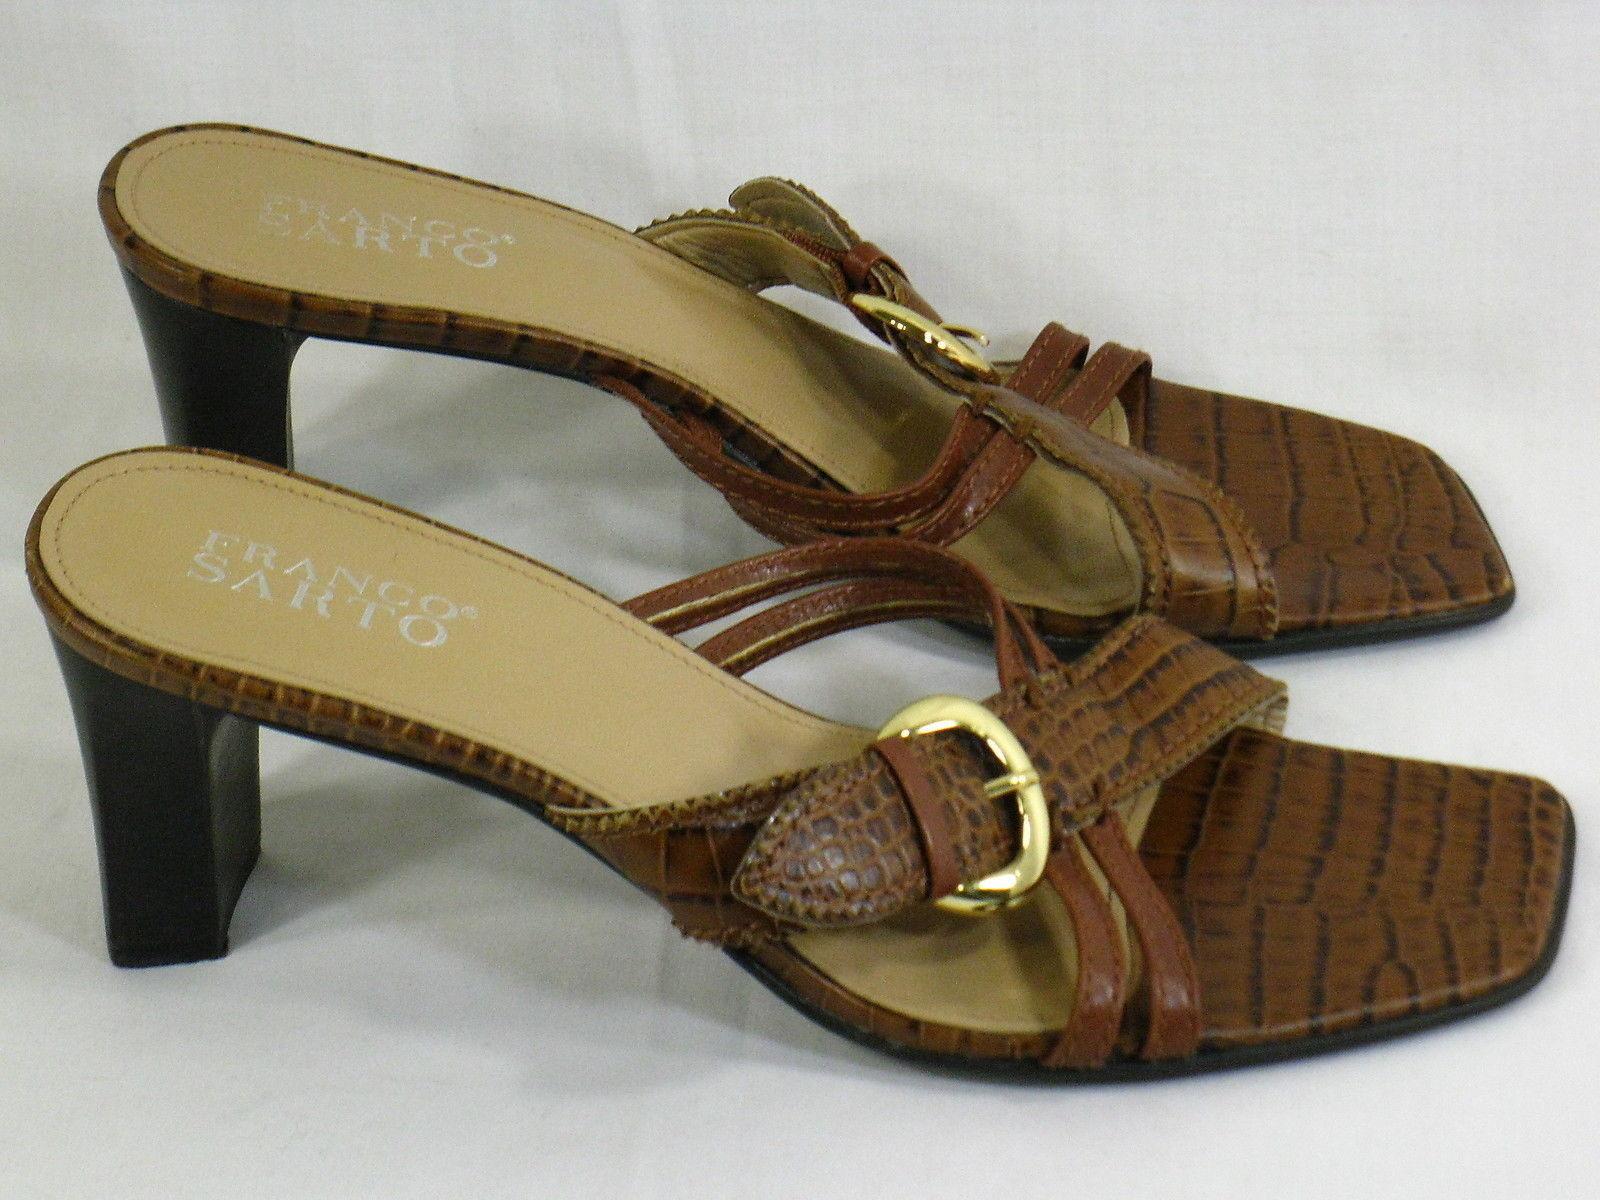 75306670ac7b Franco Sarto Brown Leather Reptile Print and 29 similar items